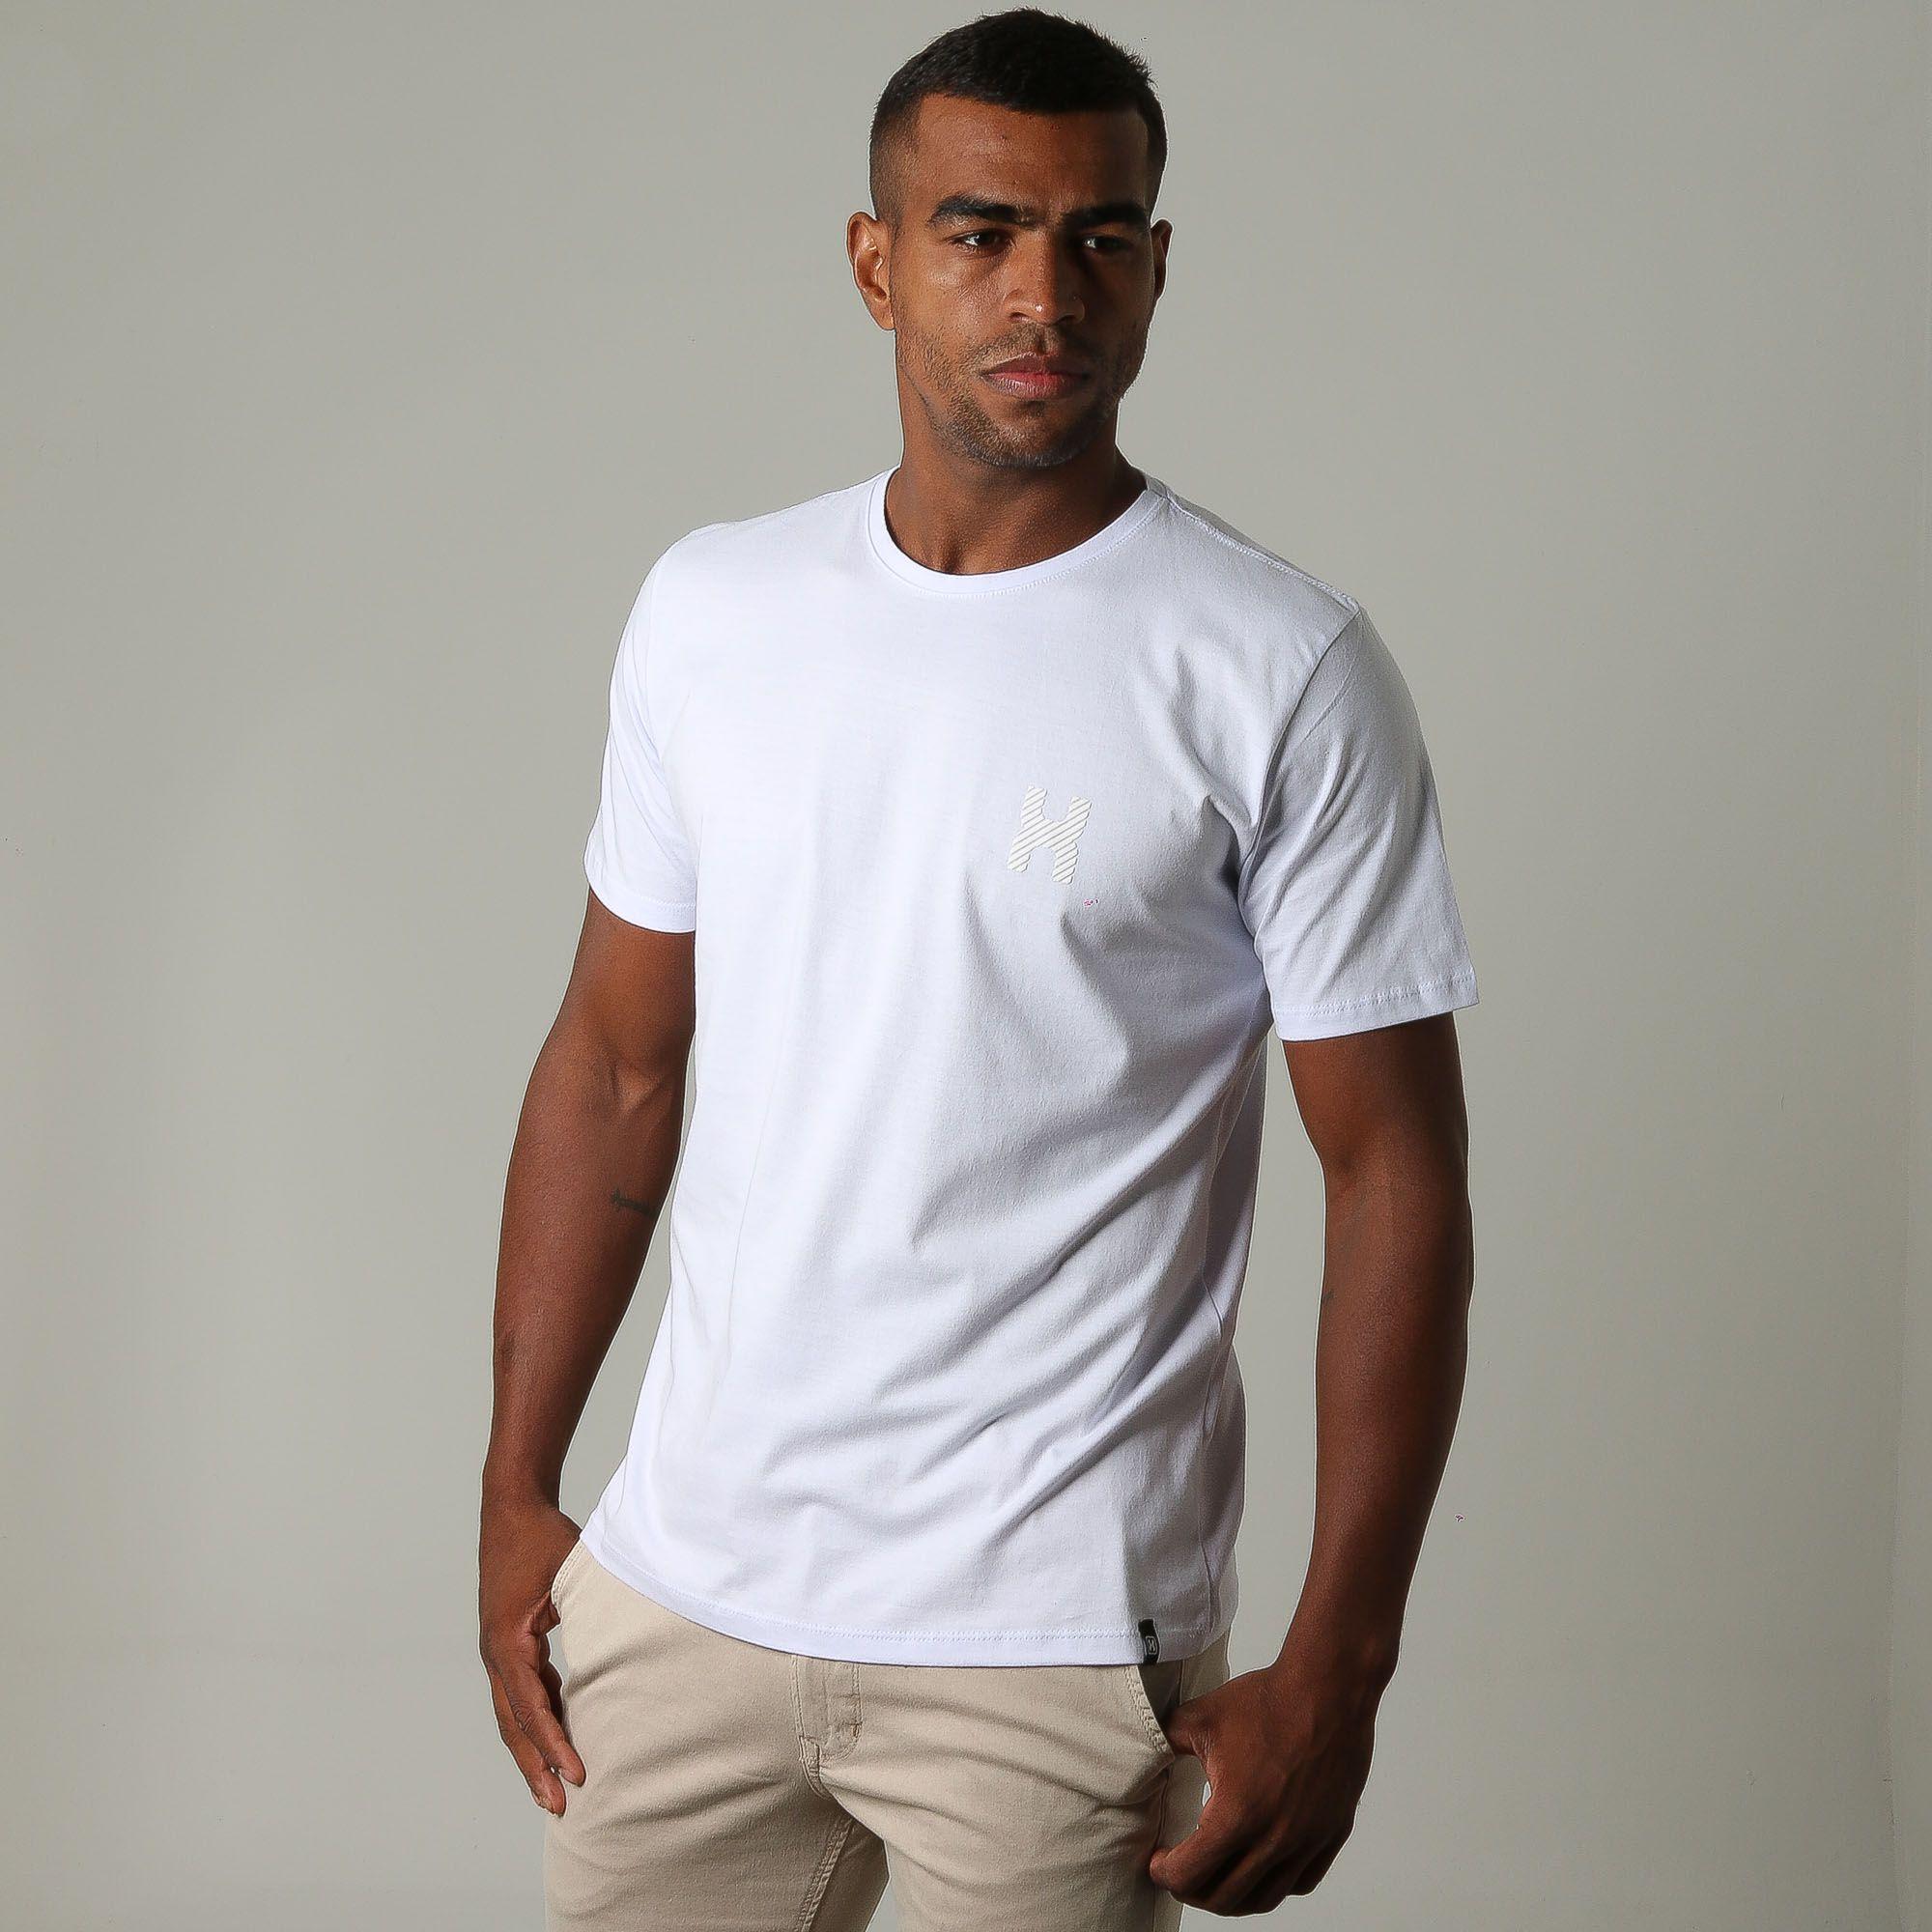 Camiseta Masculina TXC 1882